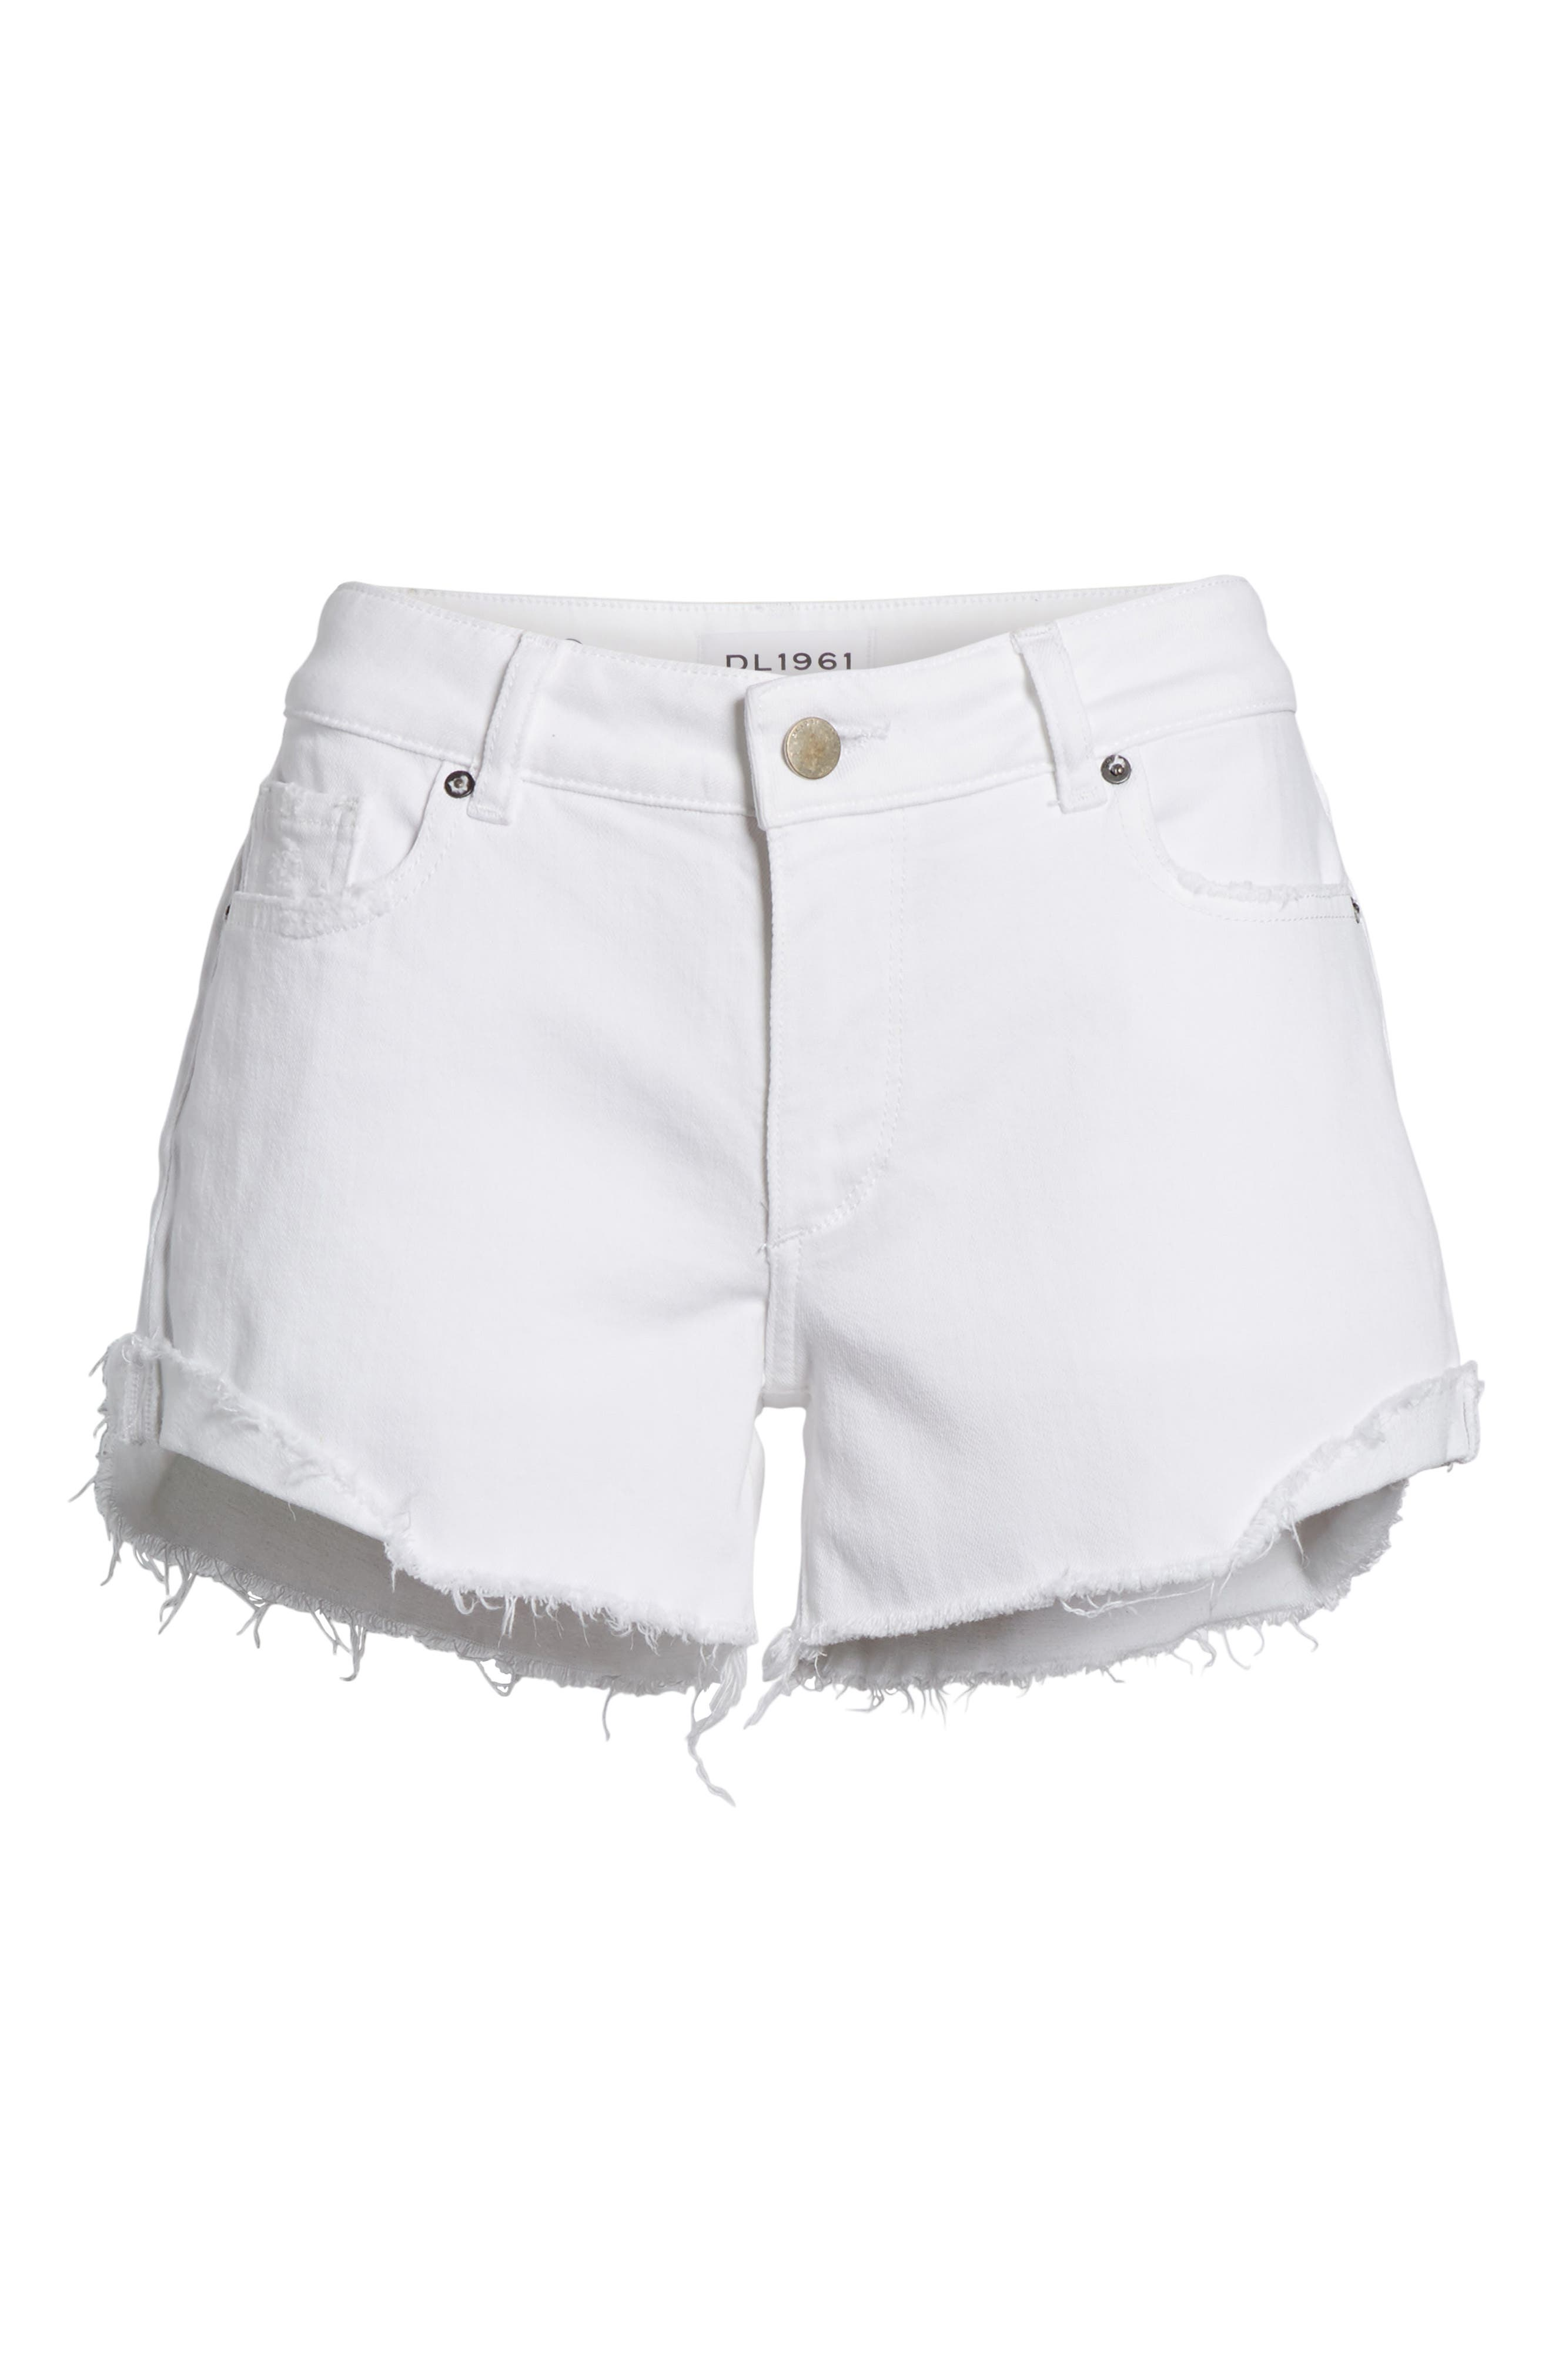 Karlie Cutoff Denim Boyfriend Shorts,                             Alternate thumbnail 6, color,                             100